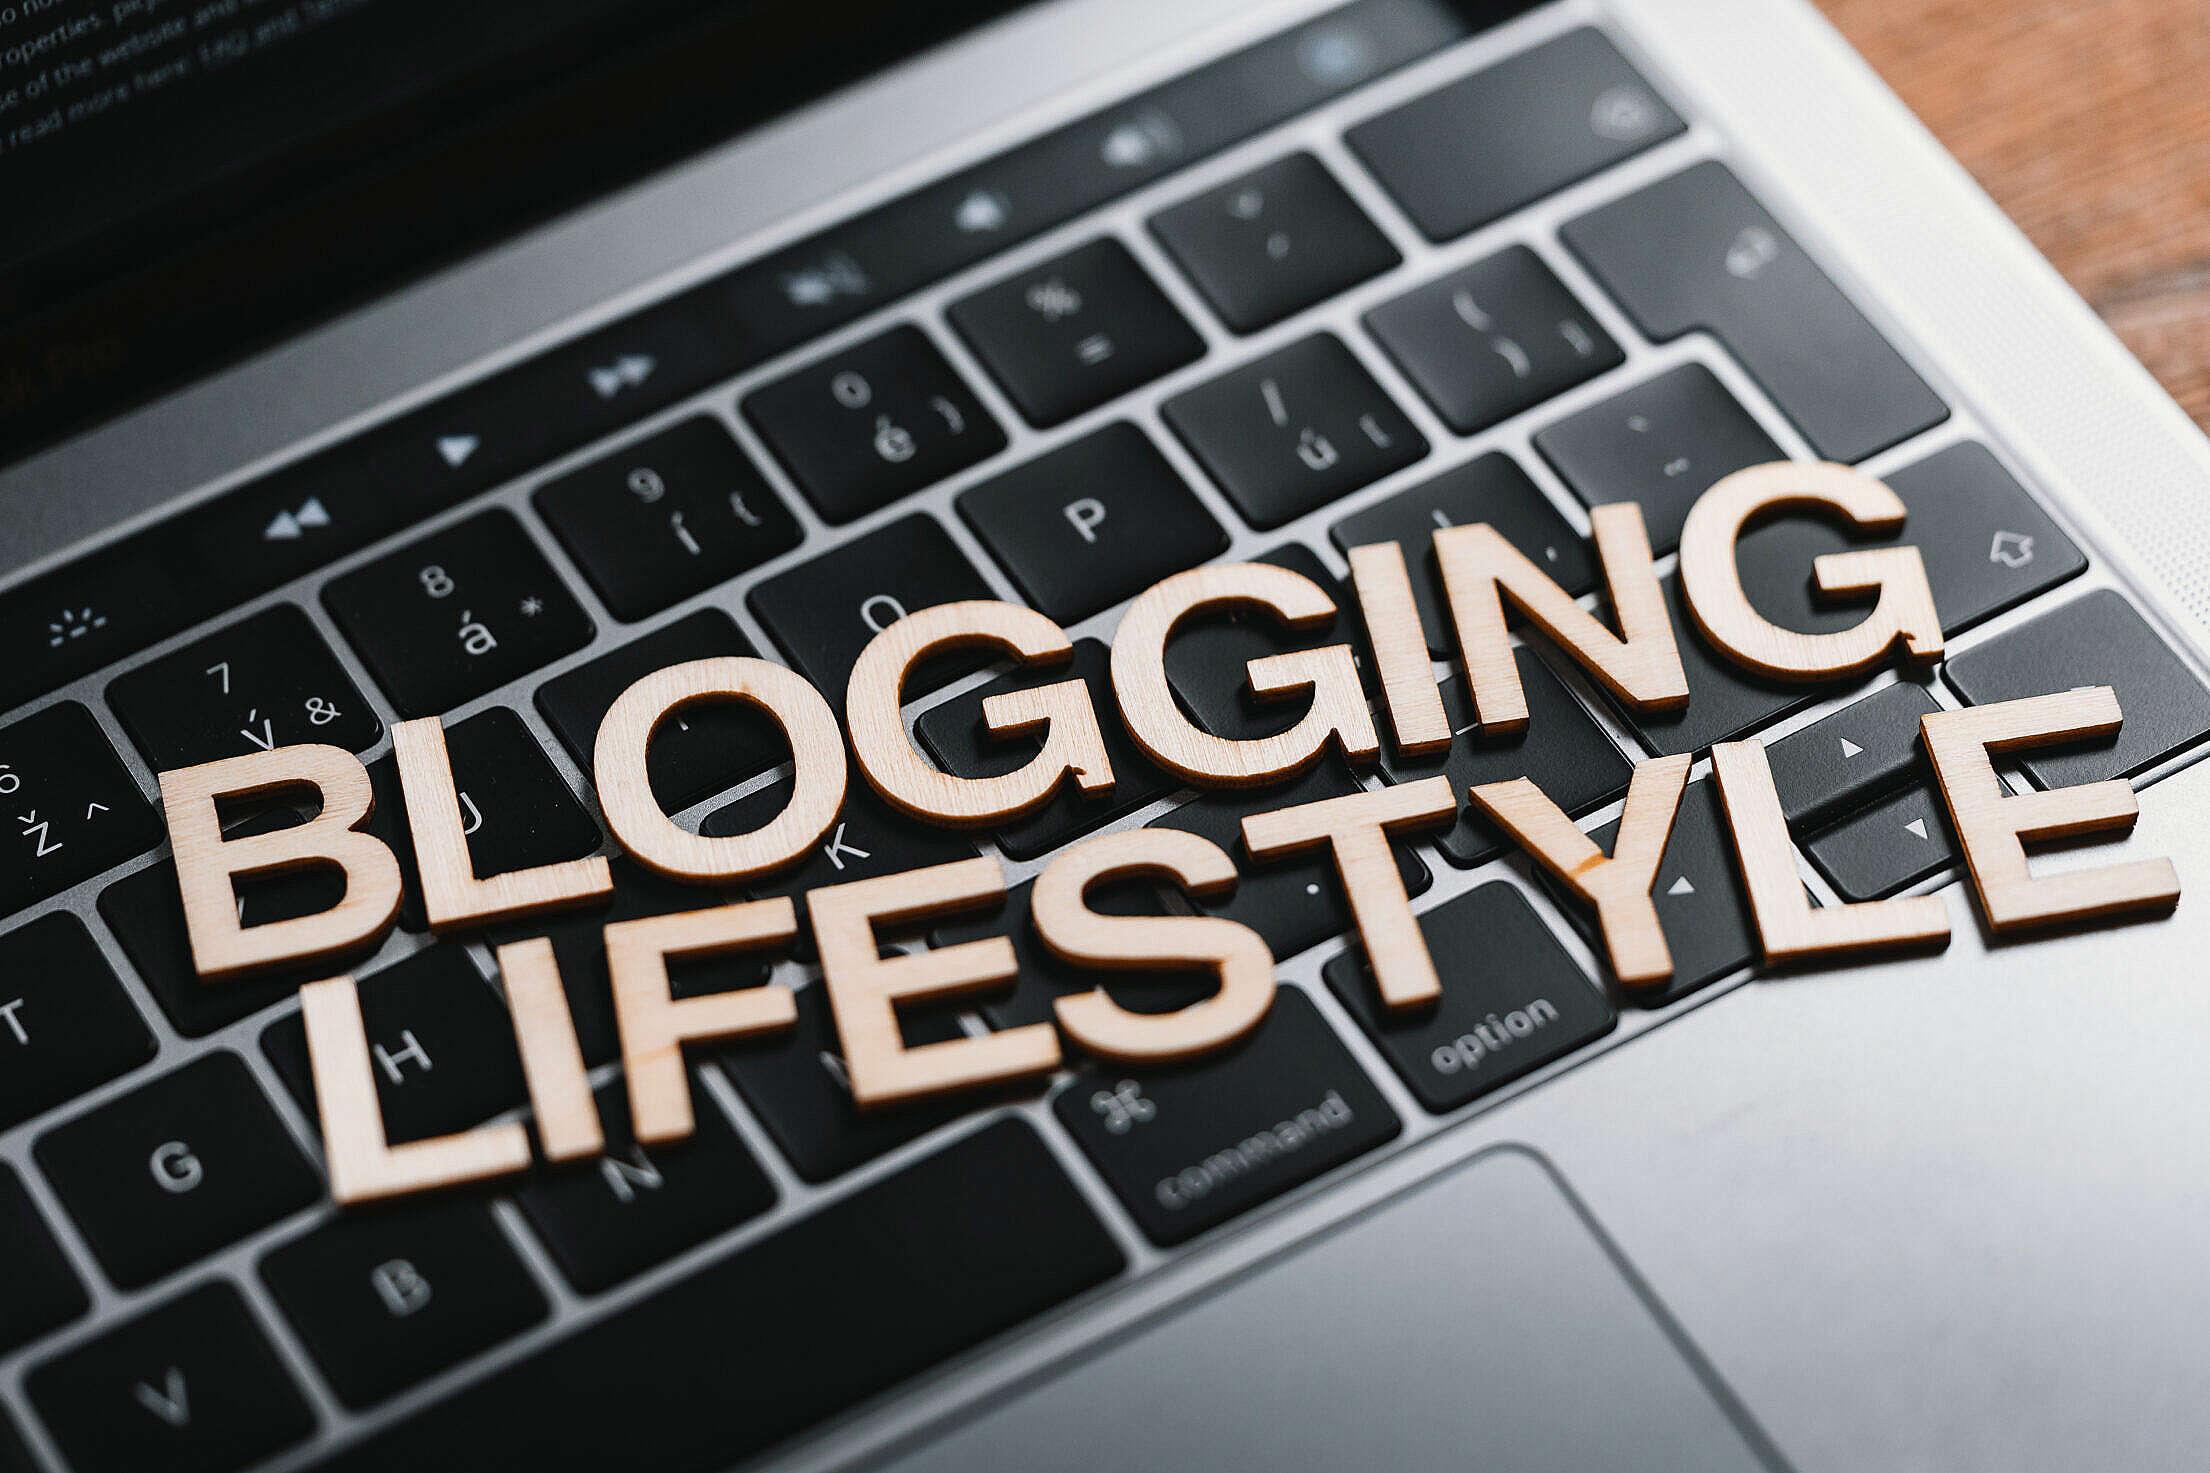 Blogging Lifestyle Free Stock Photo